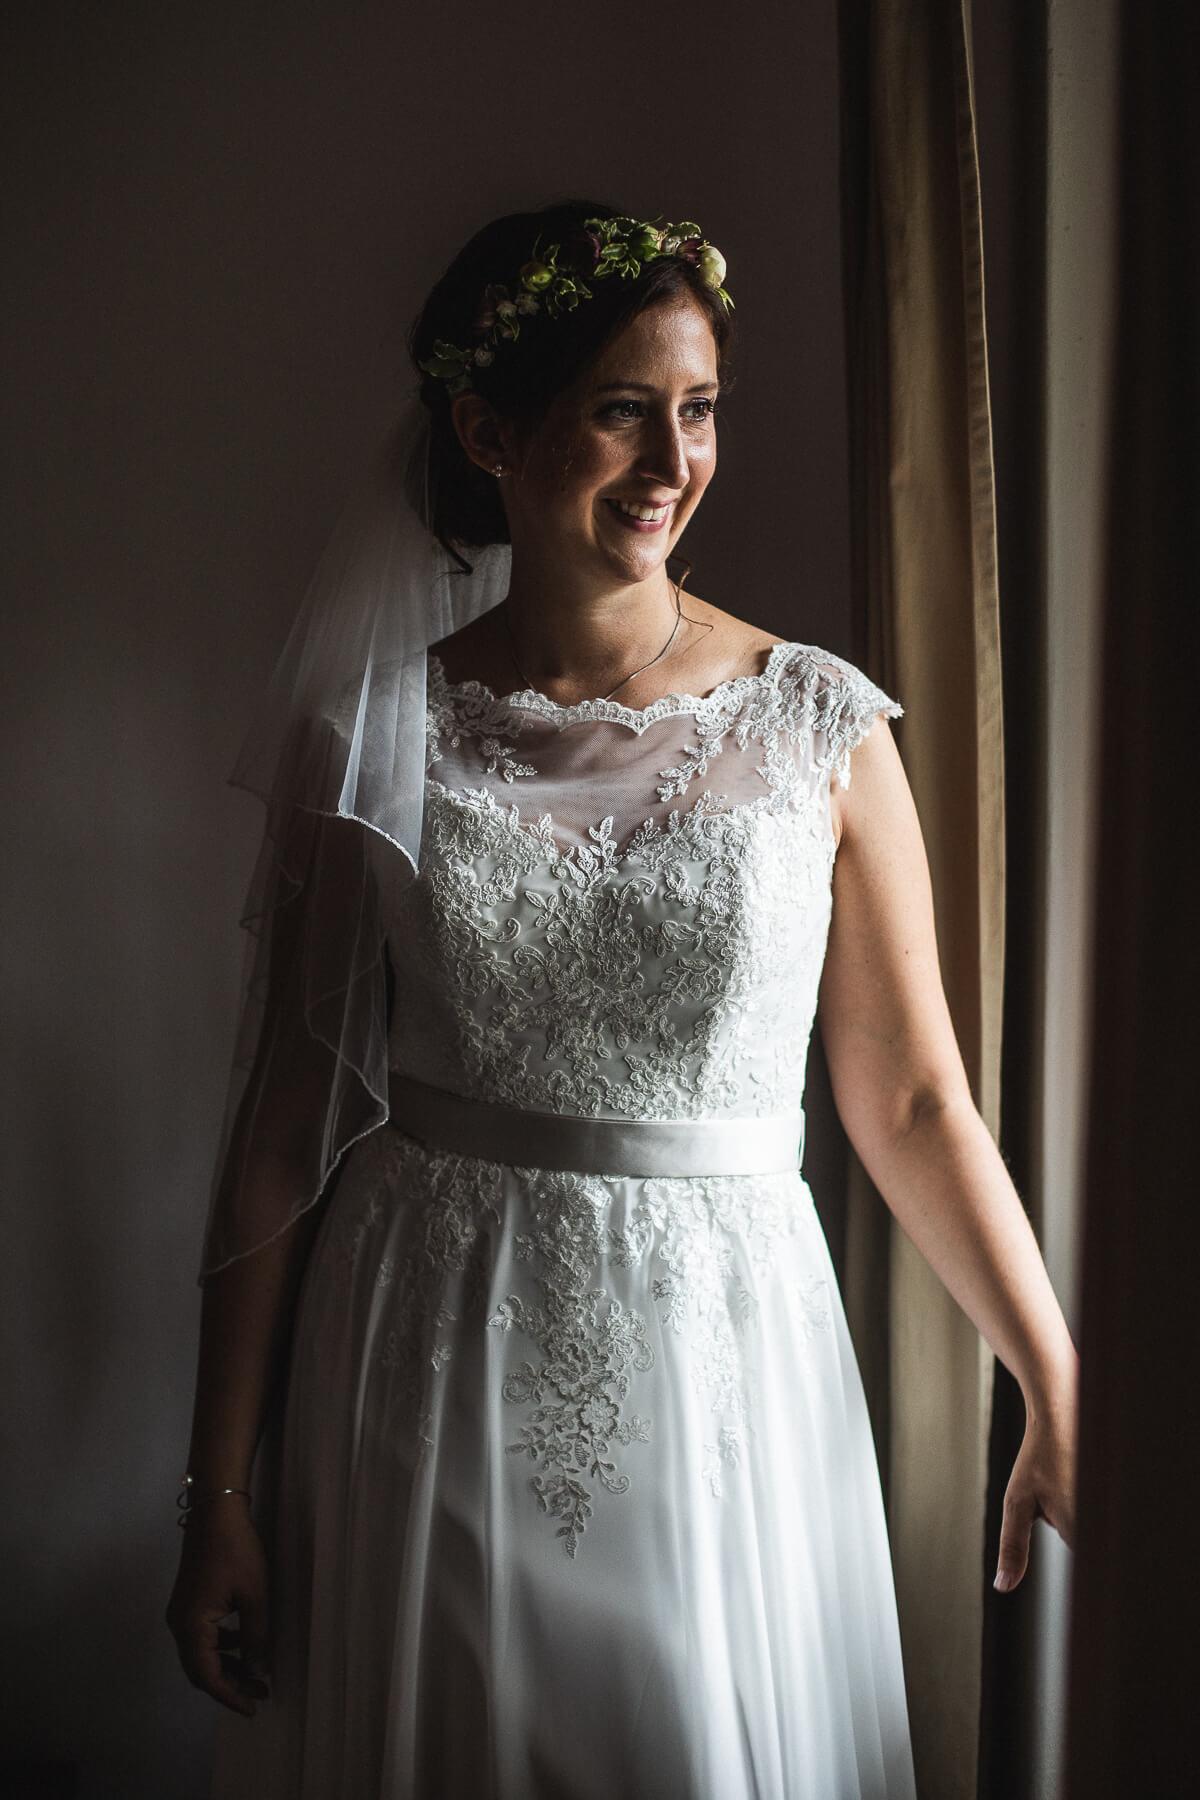 Hochzeitsreportage  Brautpaarshooting  Auermuehle  Ratingen 01